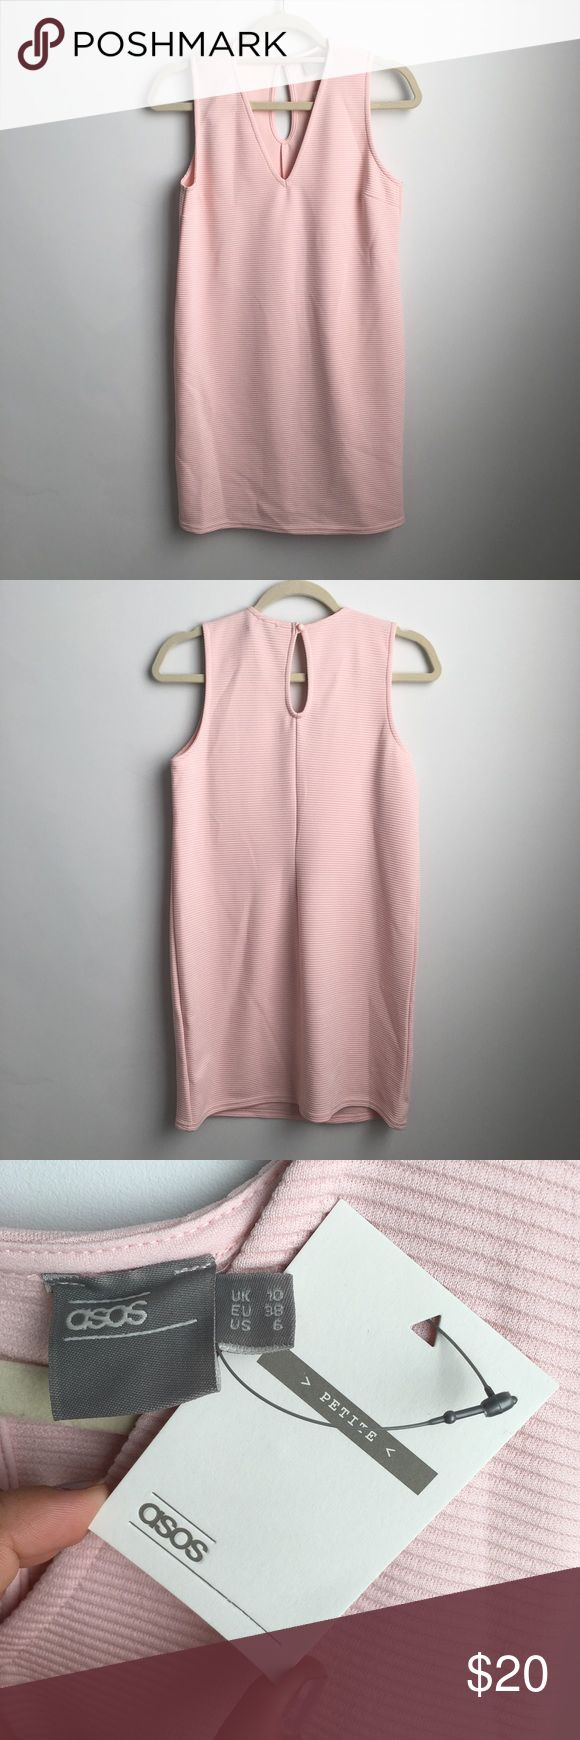 ASOS Petite Light Pink Dress ASOS Petite light pink dress NEVER WORN! Perfect condition! Cute mini dress that you can dress up or down! ASOS Petite Dresses Mini